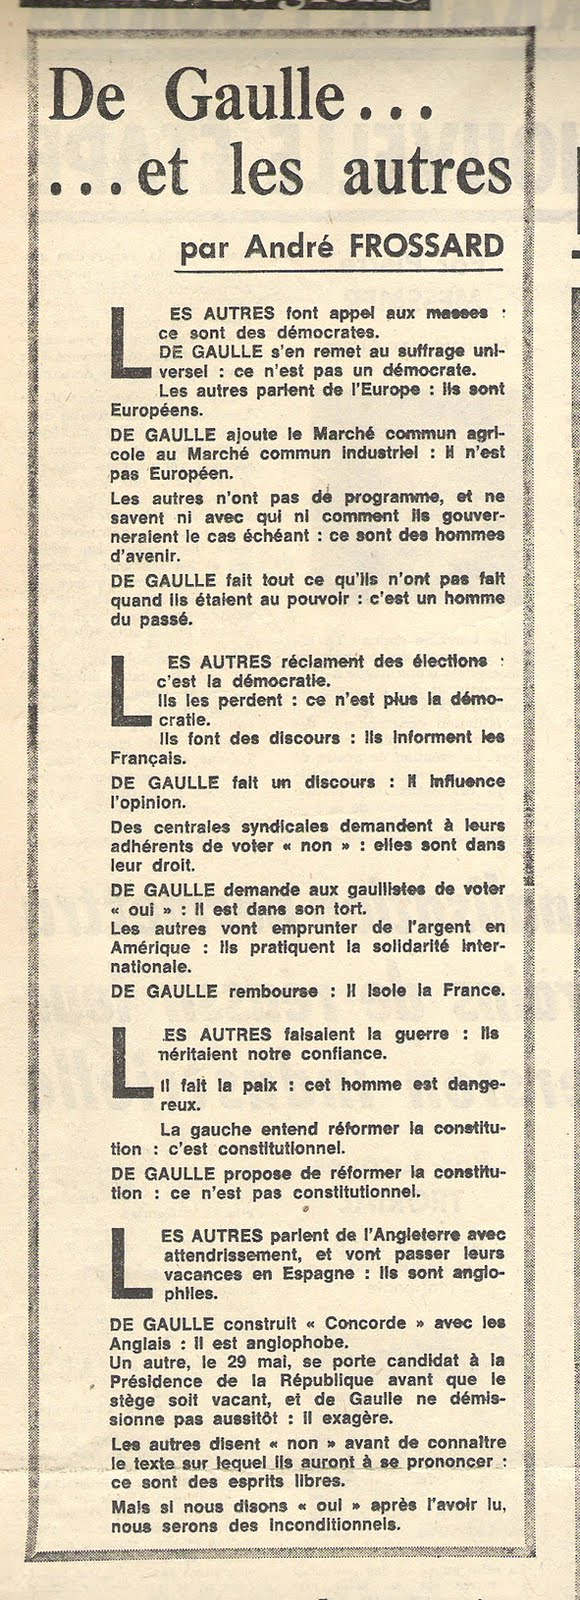 Andr FROSSARD Chroniqueur Au FIGARO